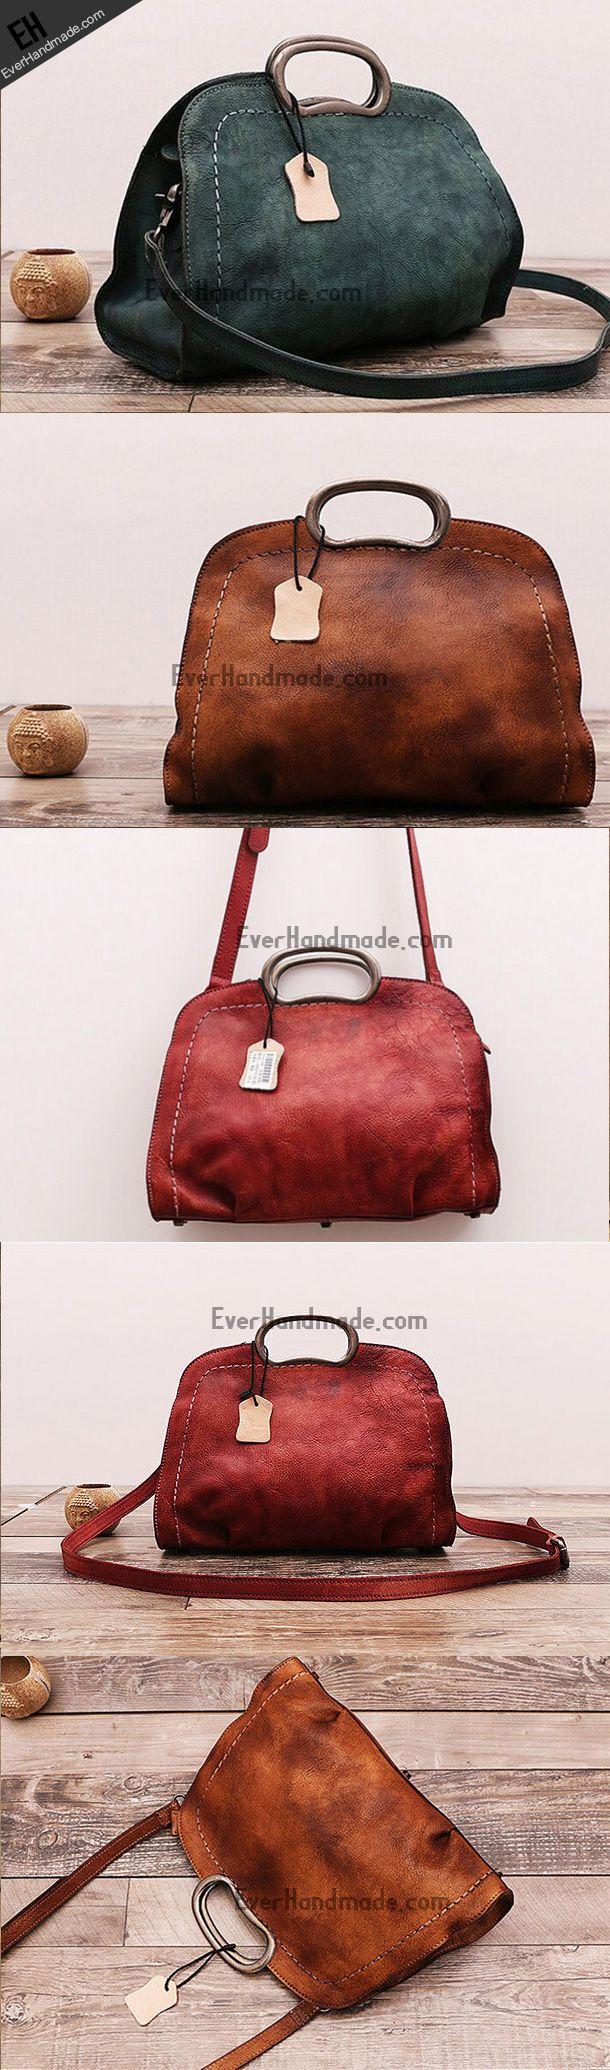 Handmade Leather handbag crossbody purse shoulder bag for